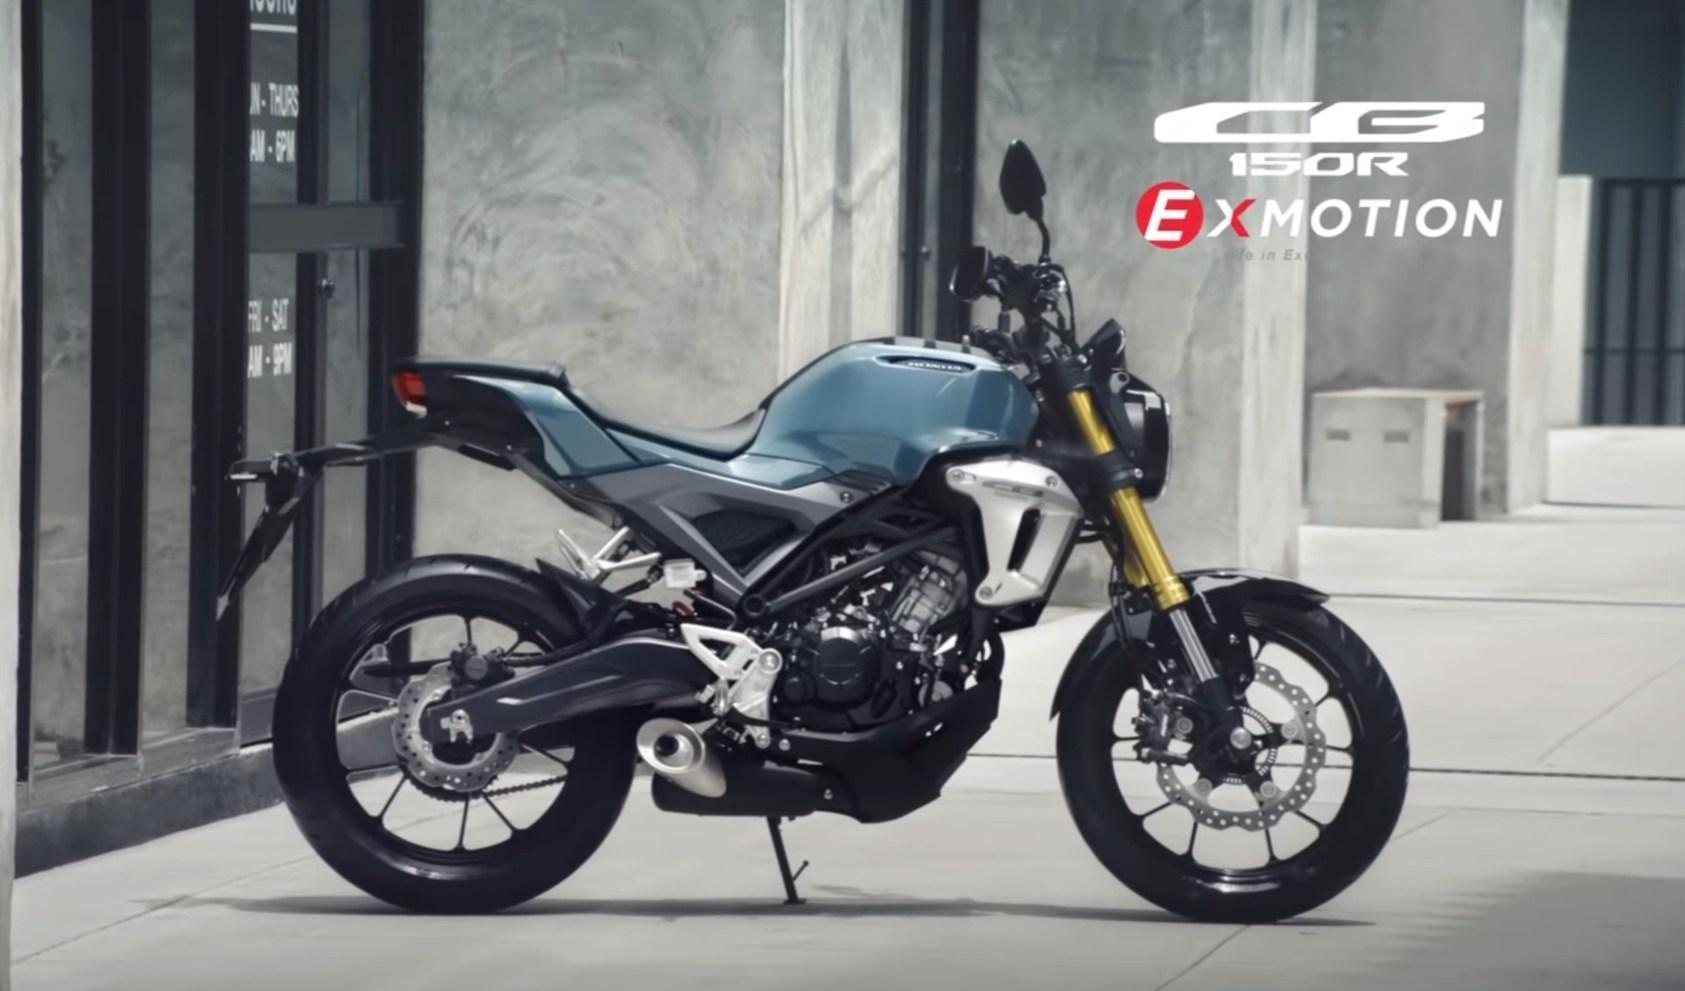 Honda CB150R ExMotion Wallpapers